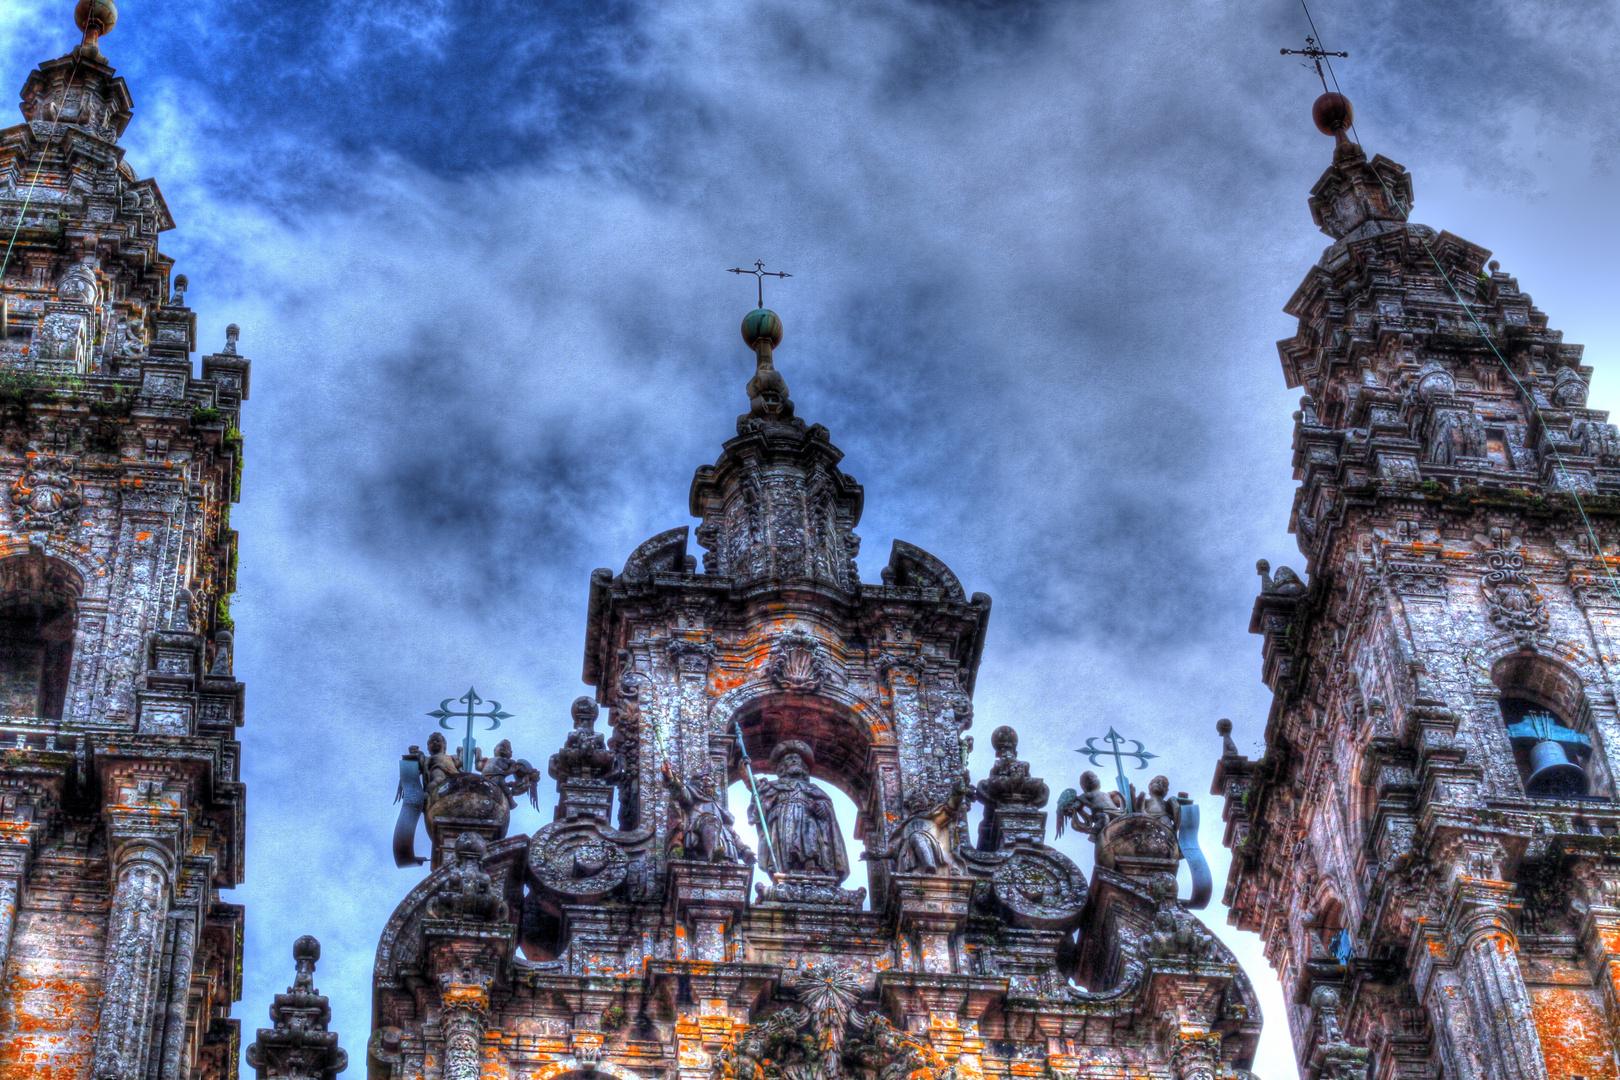 Santiago,Spain